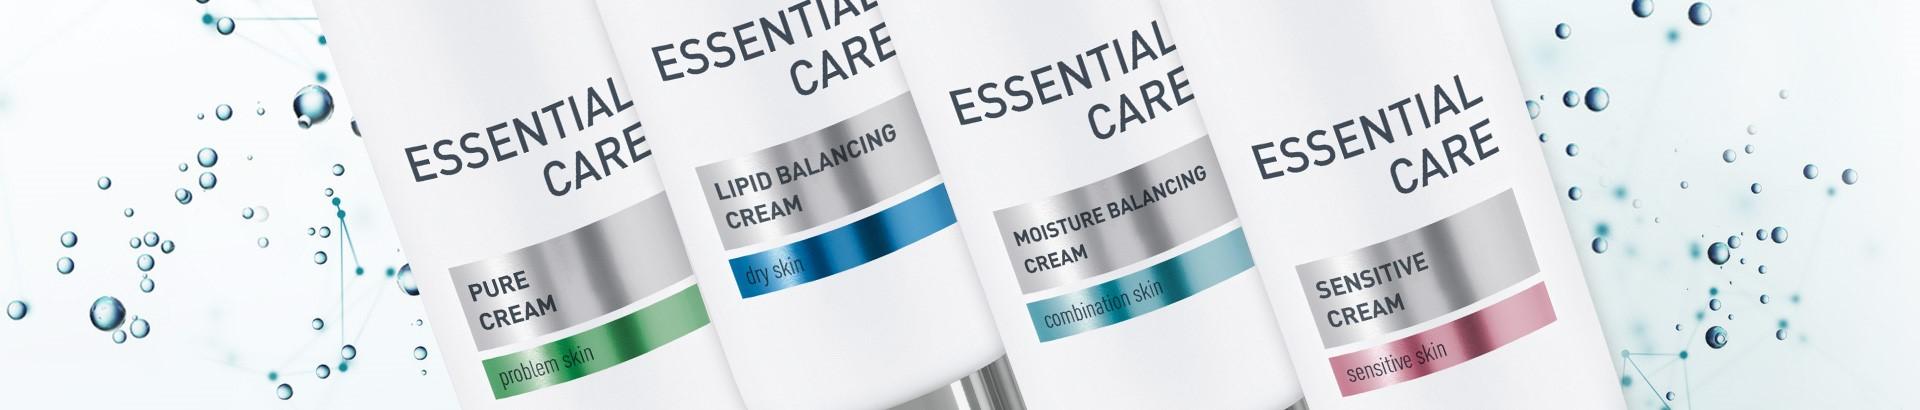 Babor Essential Care